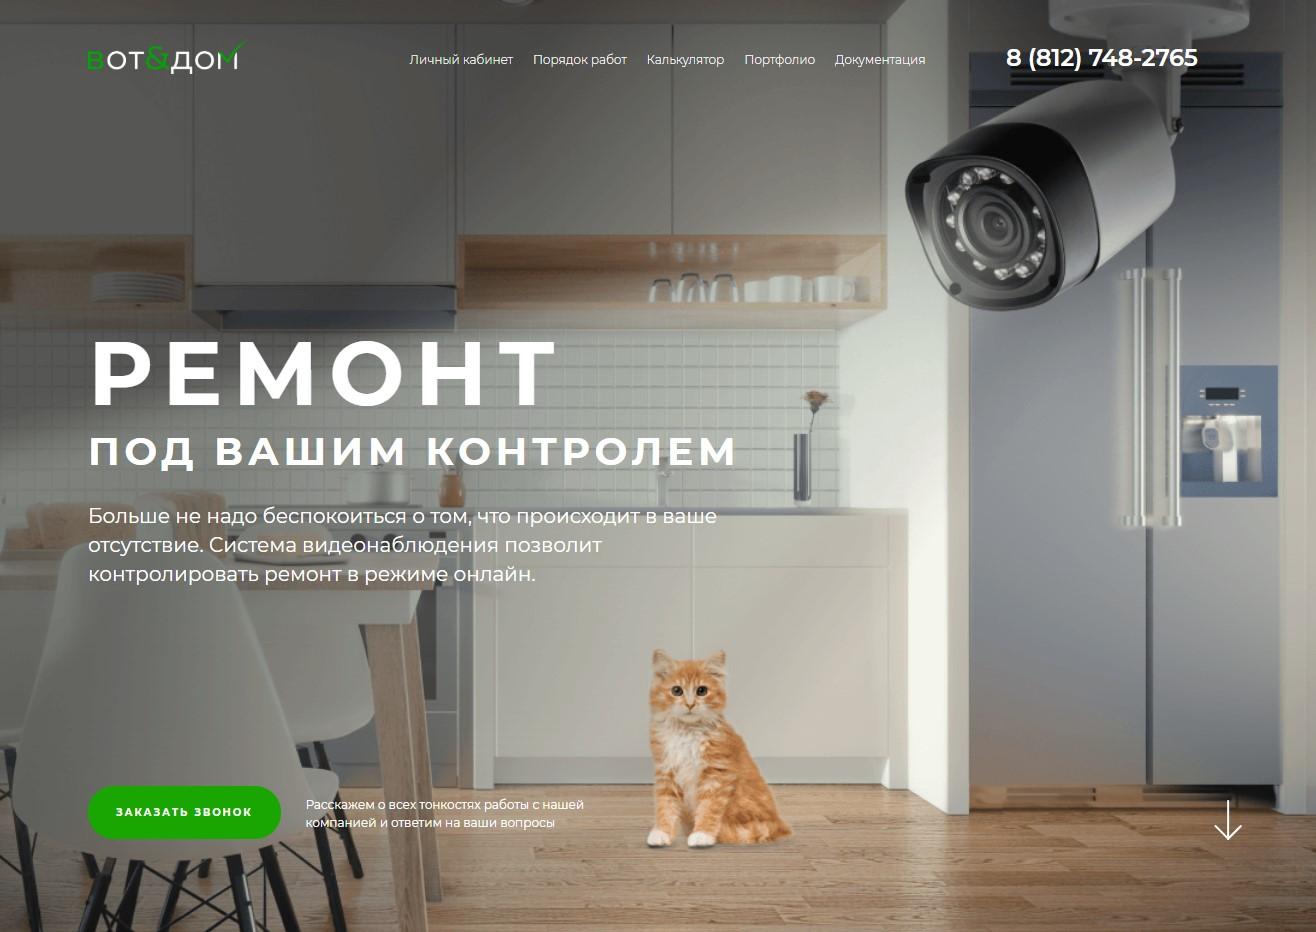 Сайт под ключ по ремонту квартир